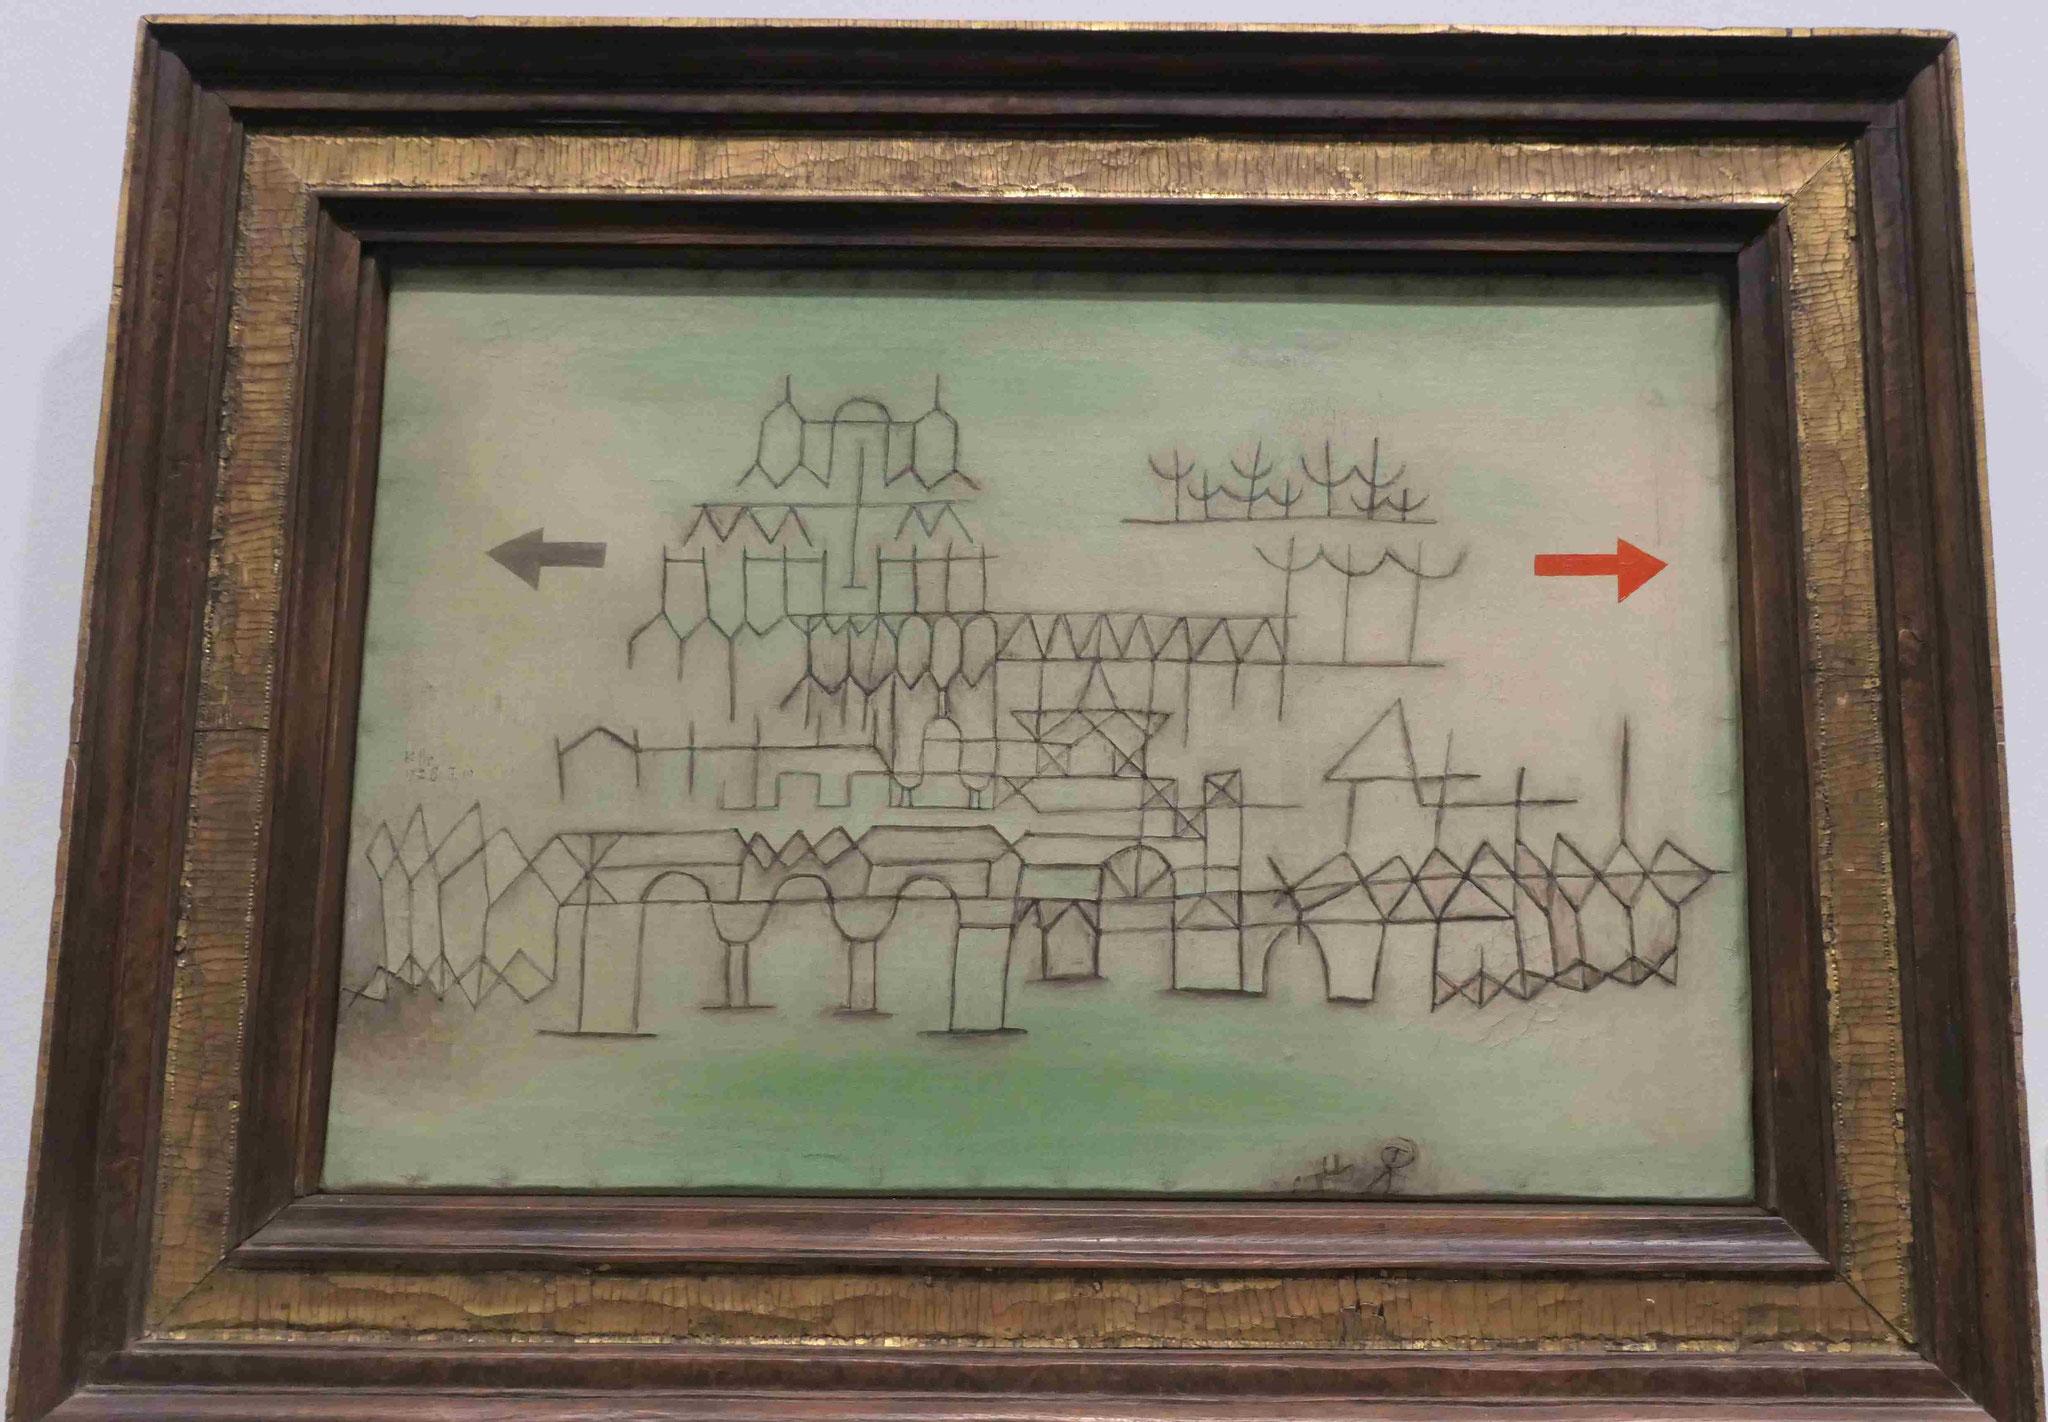 Paul Klee, Palast im Vorübergehn, 1928